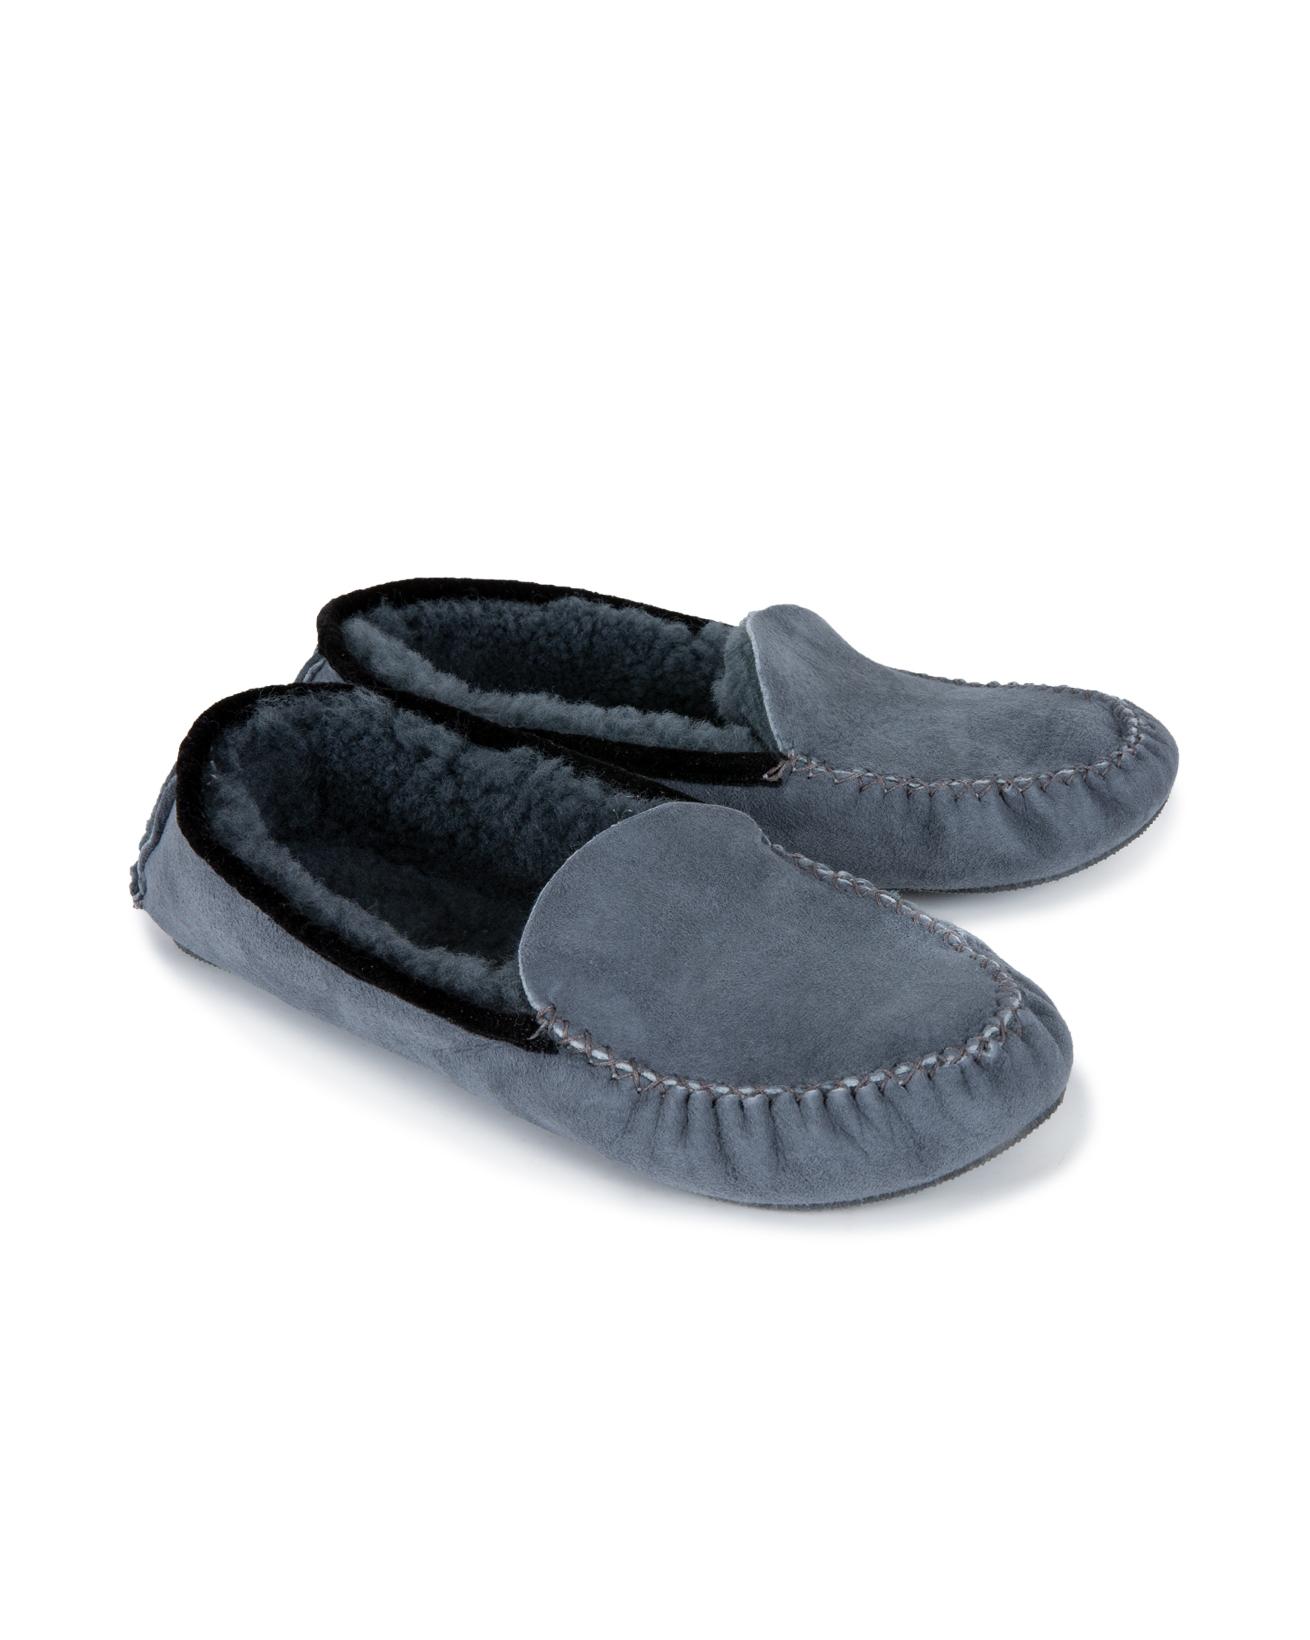 Dena Moccasins - Size 8 - Dark Grey - 808